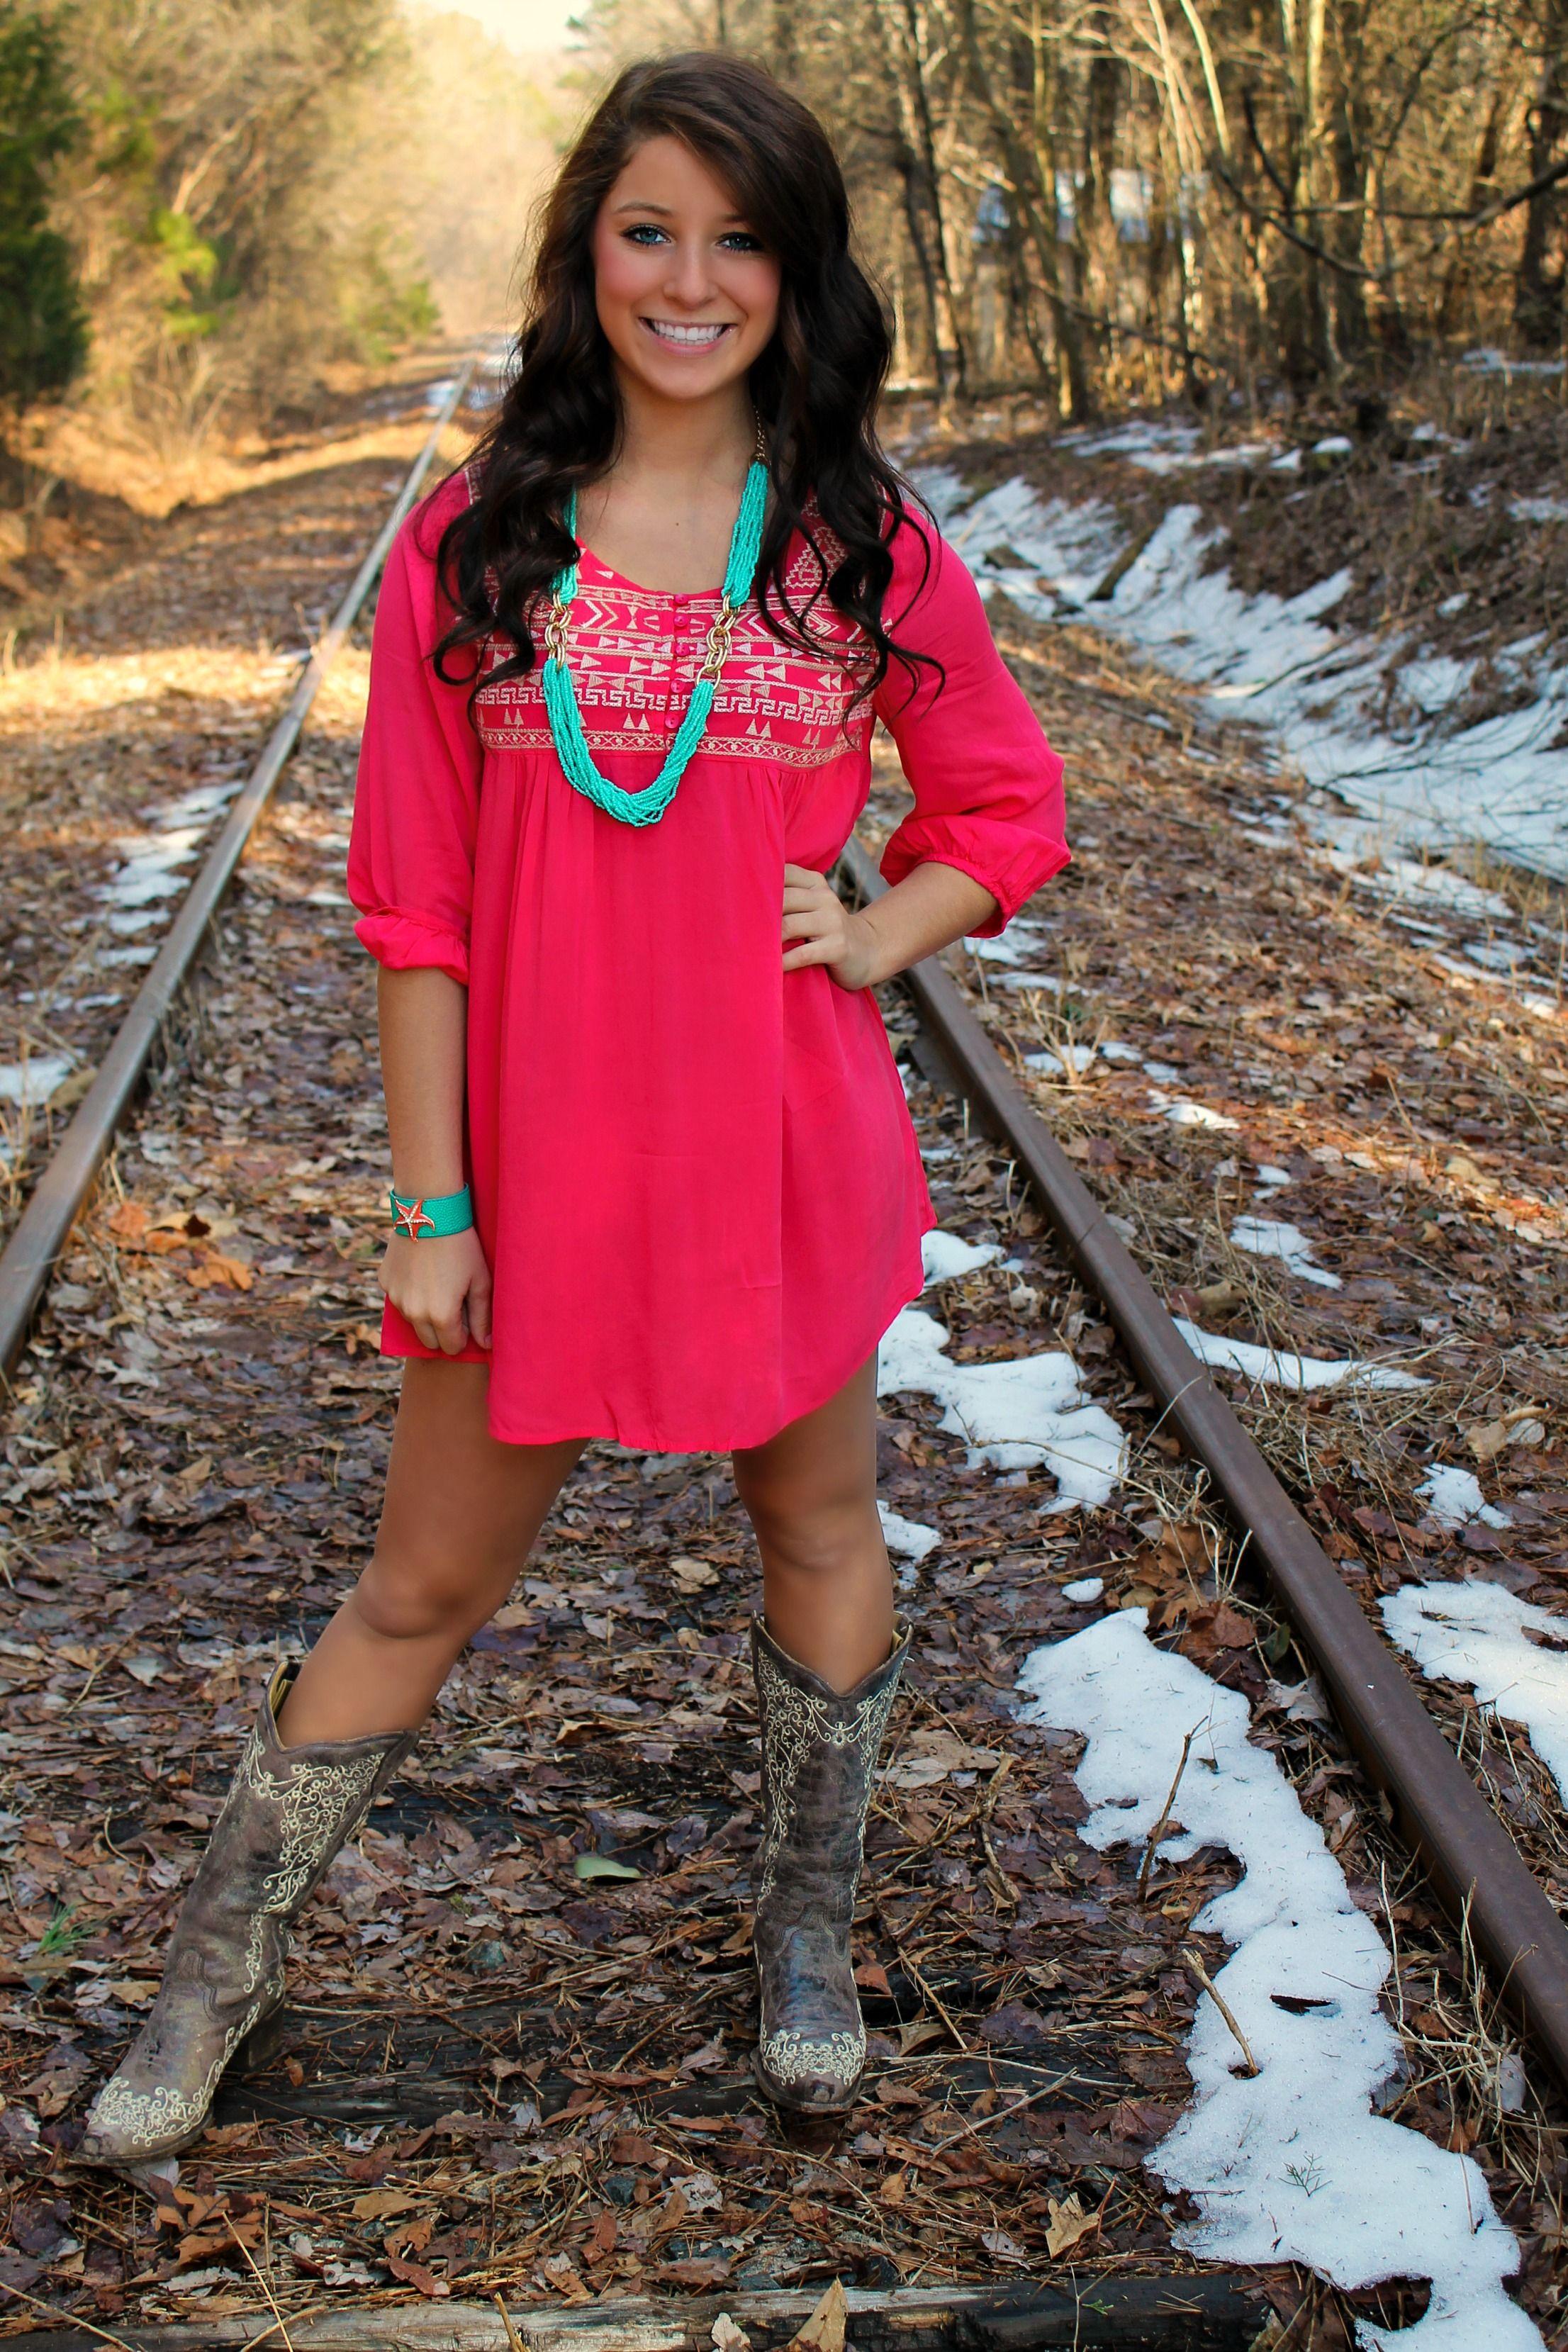 c2165b9afc Judy Tunic Dress - Hot Pink  46.99  southernfriedchics